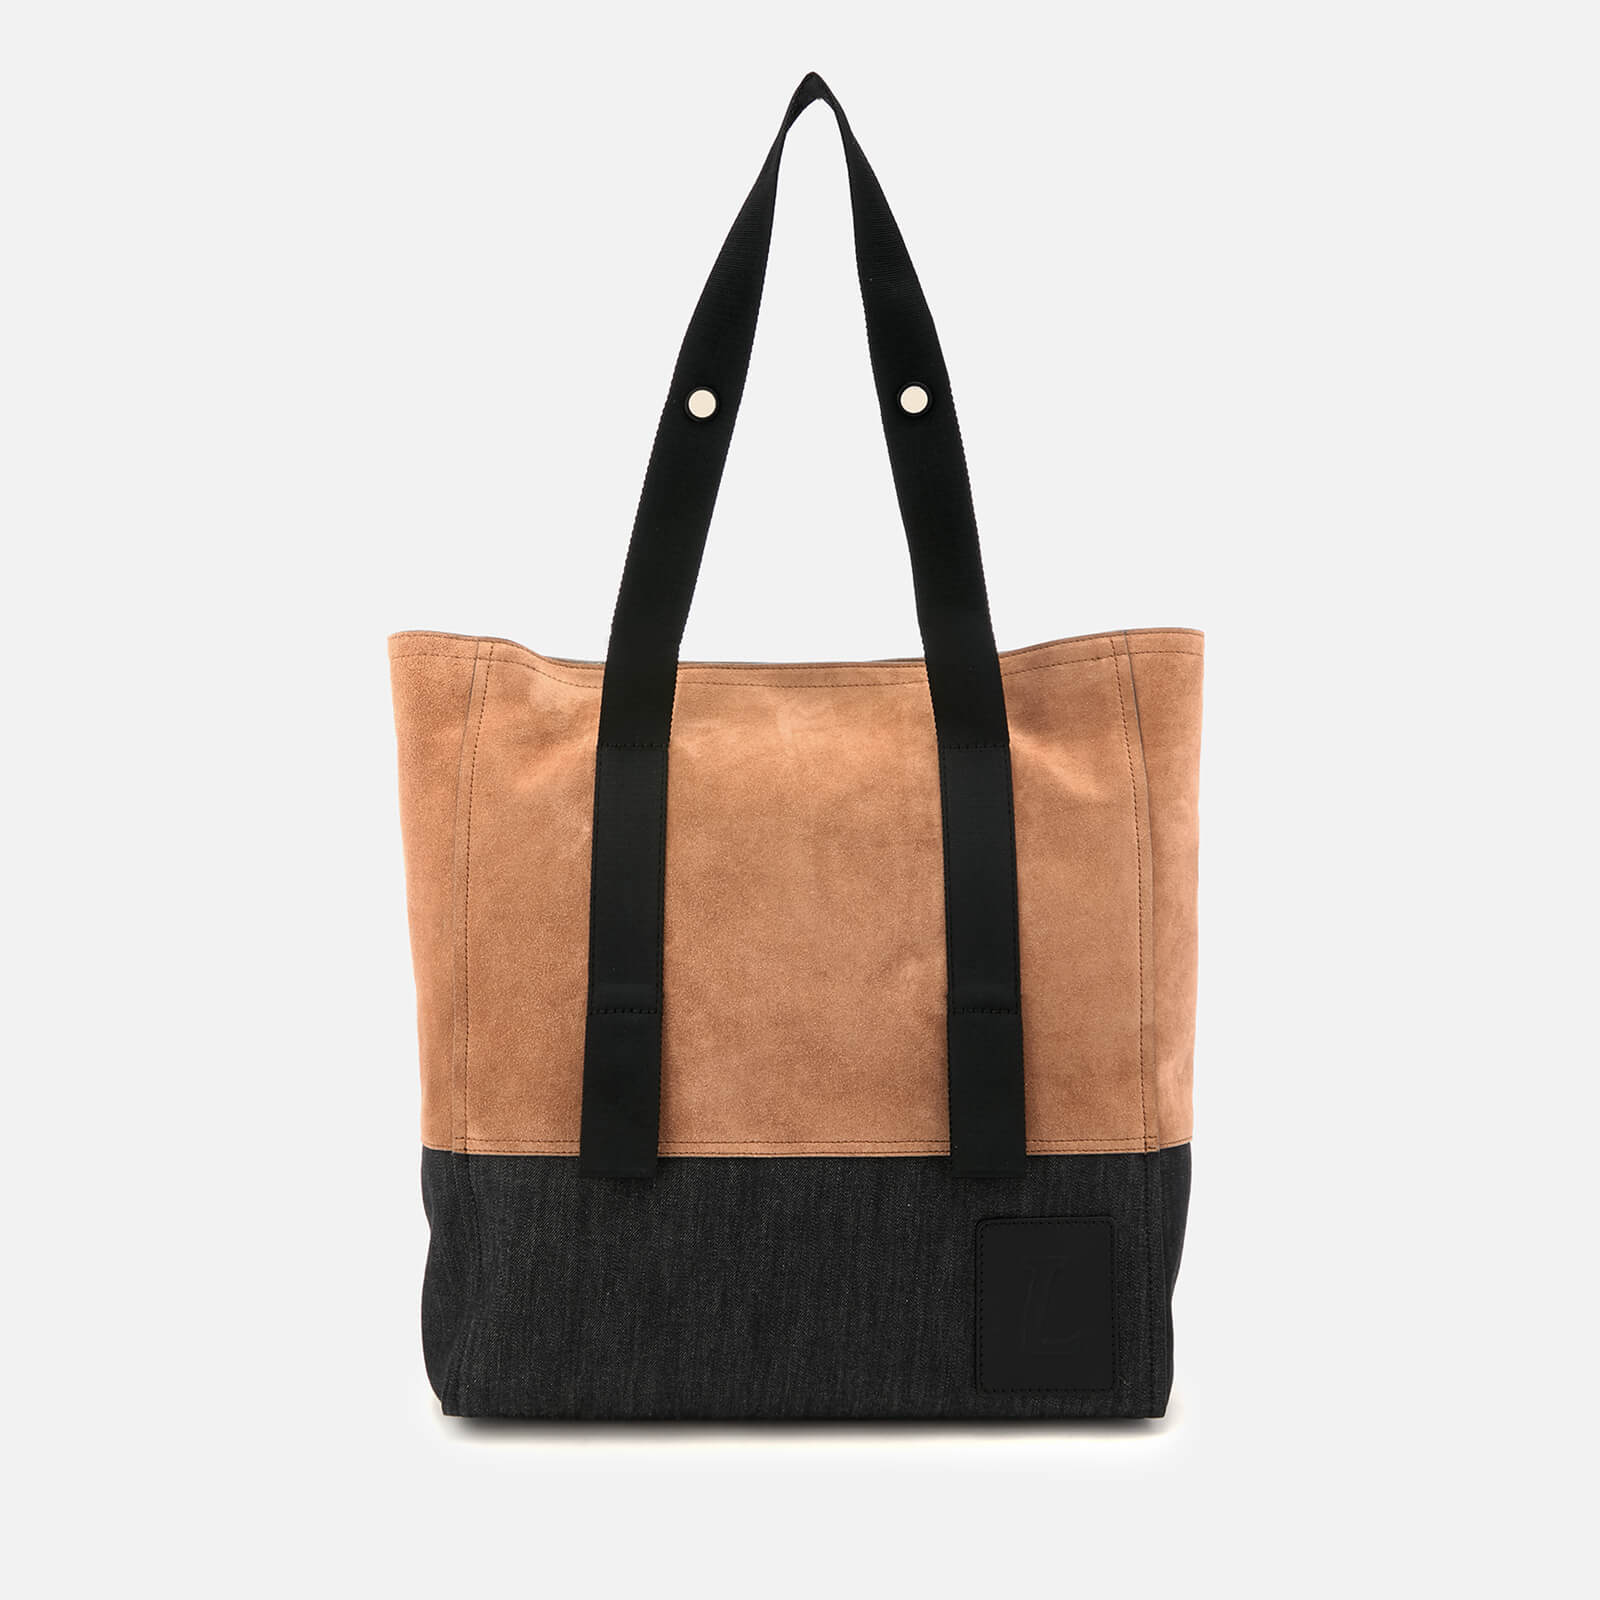 2ca6c966 Lanvin Men's Suede Tote Bag - Black/Light Brown